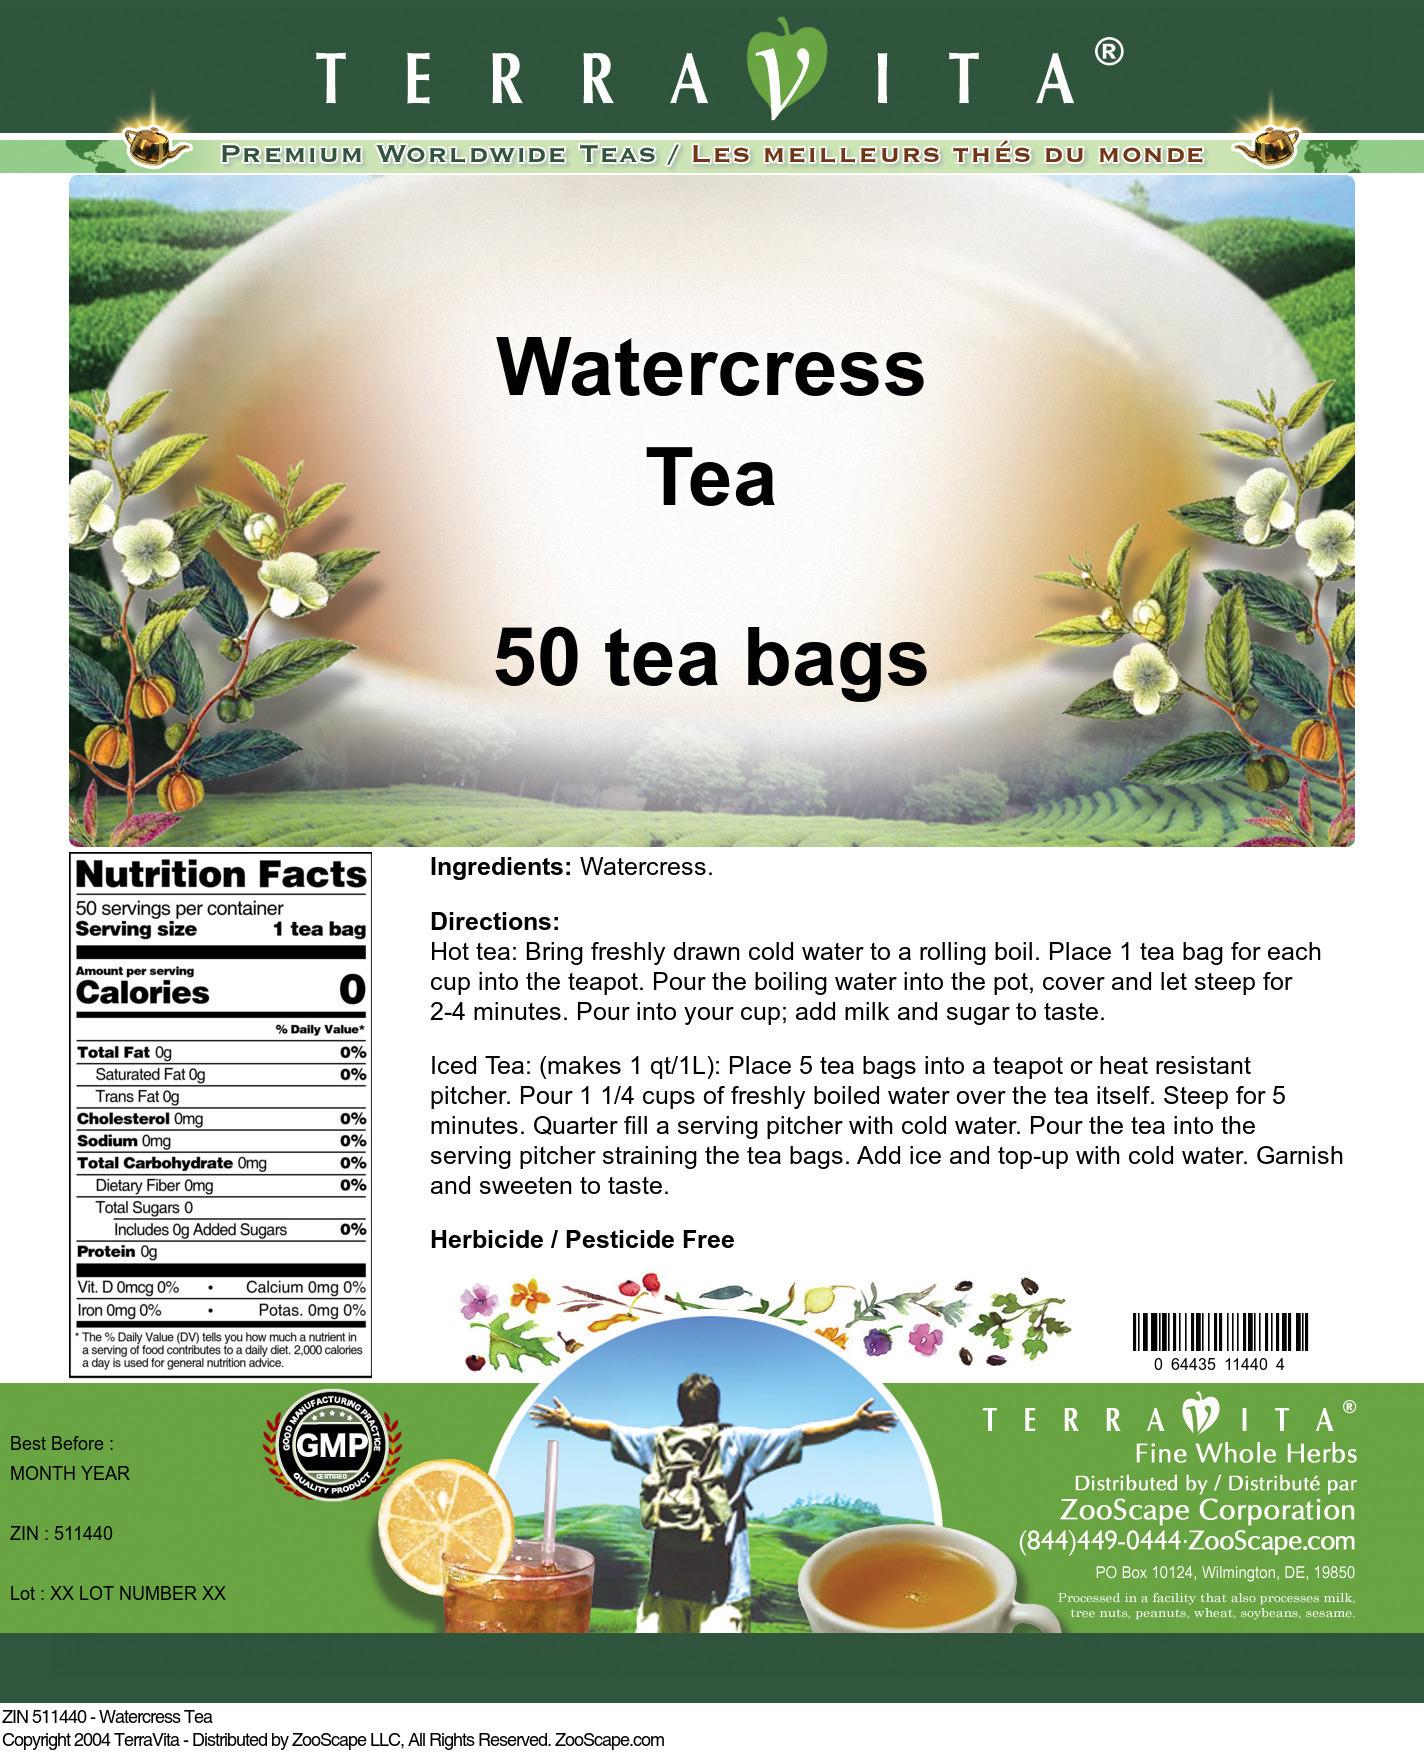 Watercress Tea